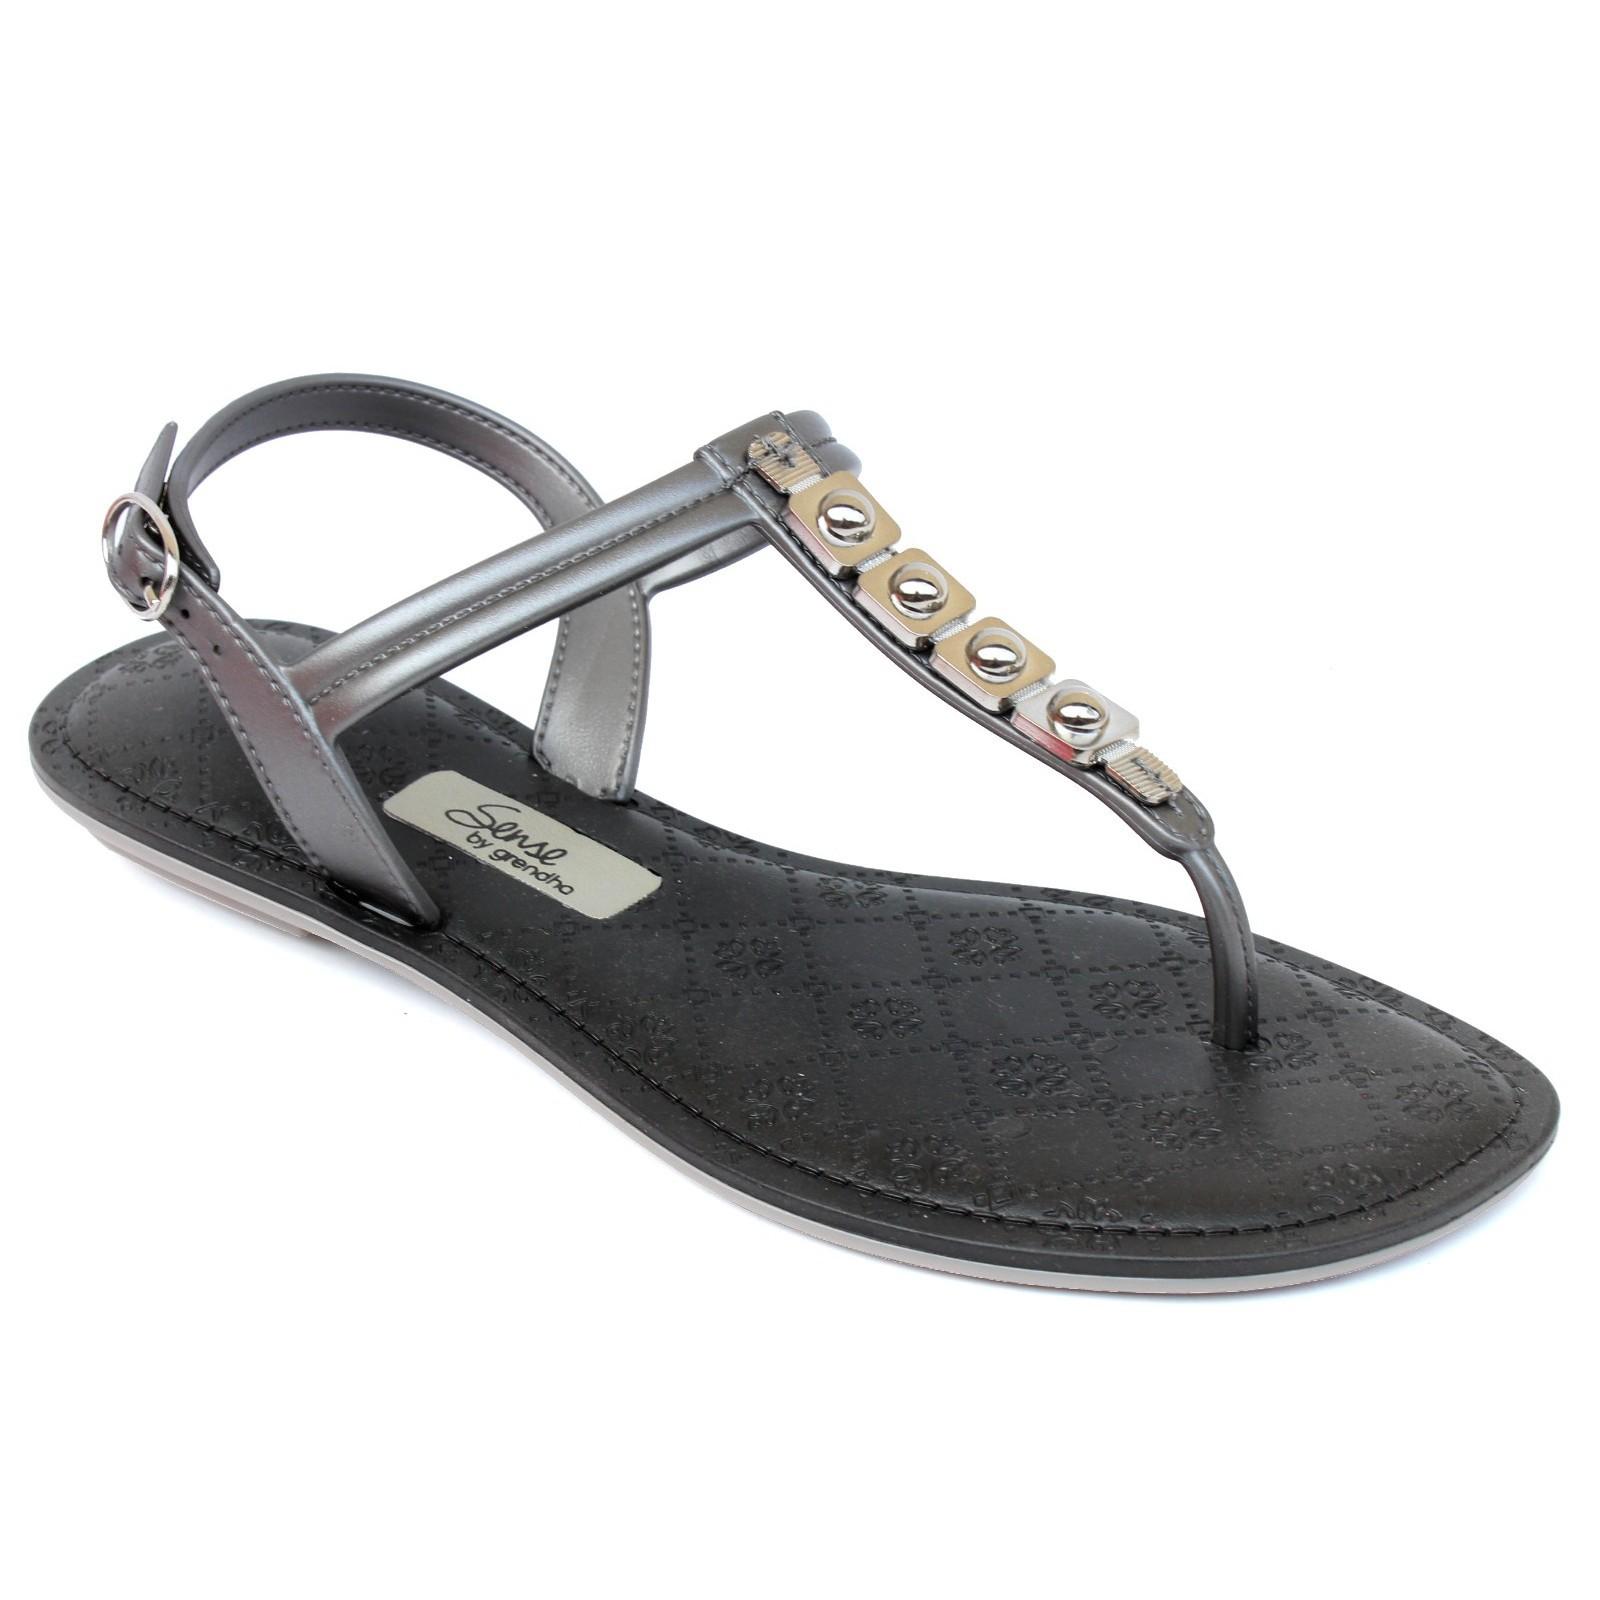 37 es méretű Grendha női cipő Grendha női papucs és